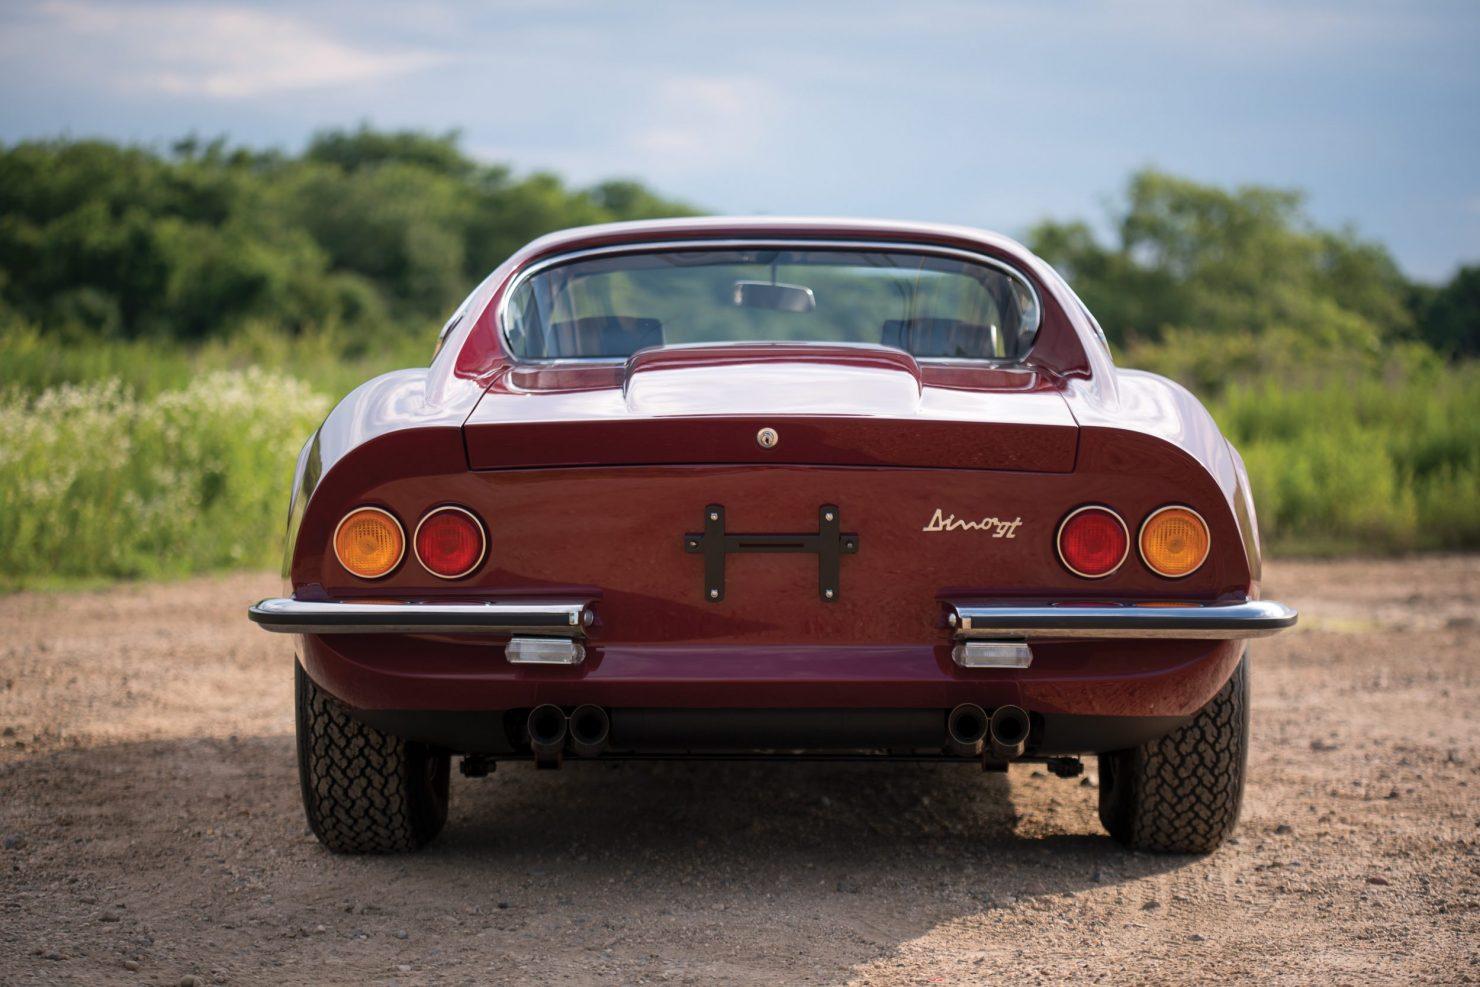 ferrari dino 246 10 1480x987 - 1969 Ferrari Dino 246 GT